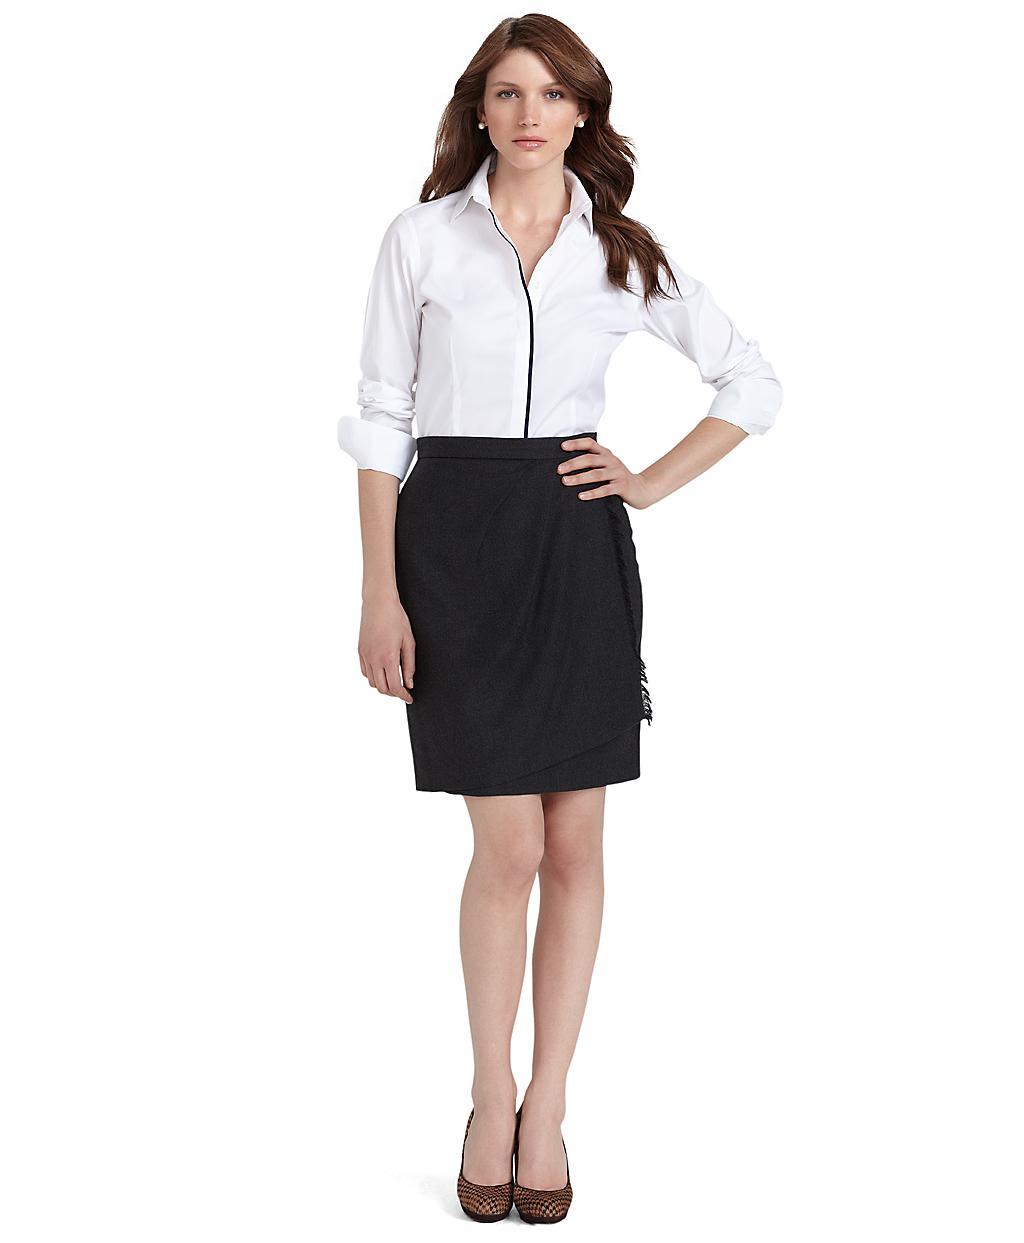 blusa y falda 2